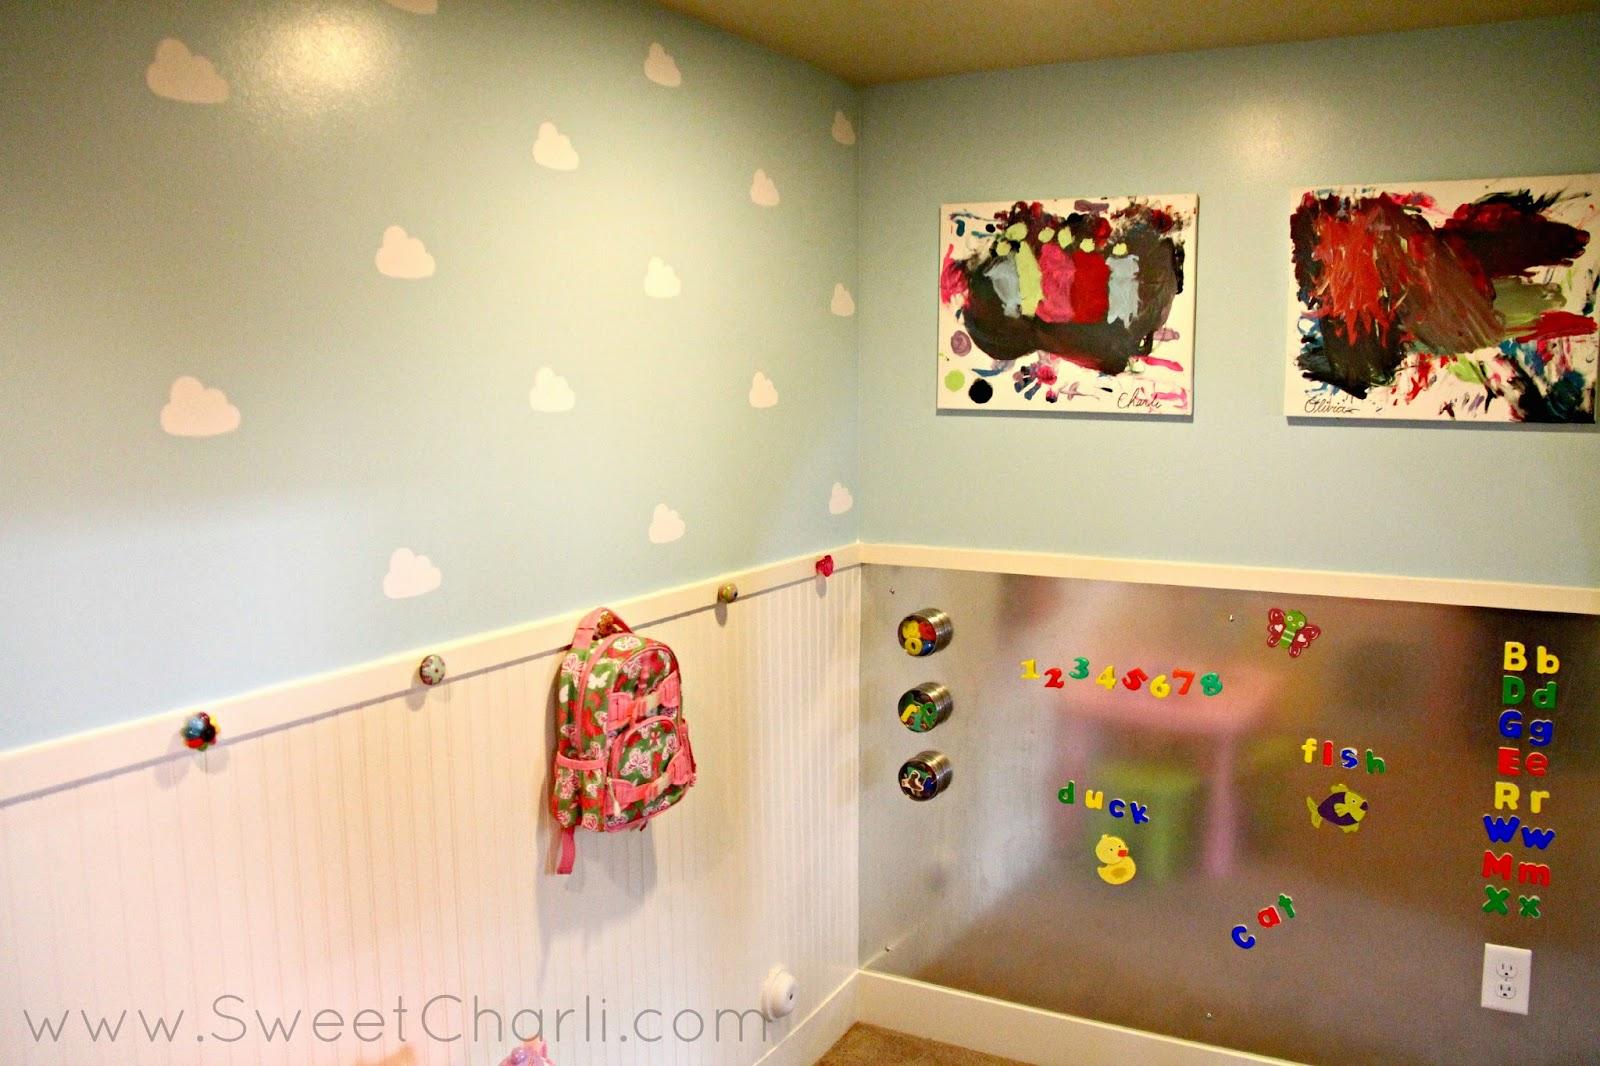 Inside Our Playroom - Vinyl Cloud Walls - Sweet Charli